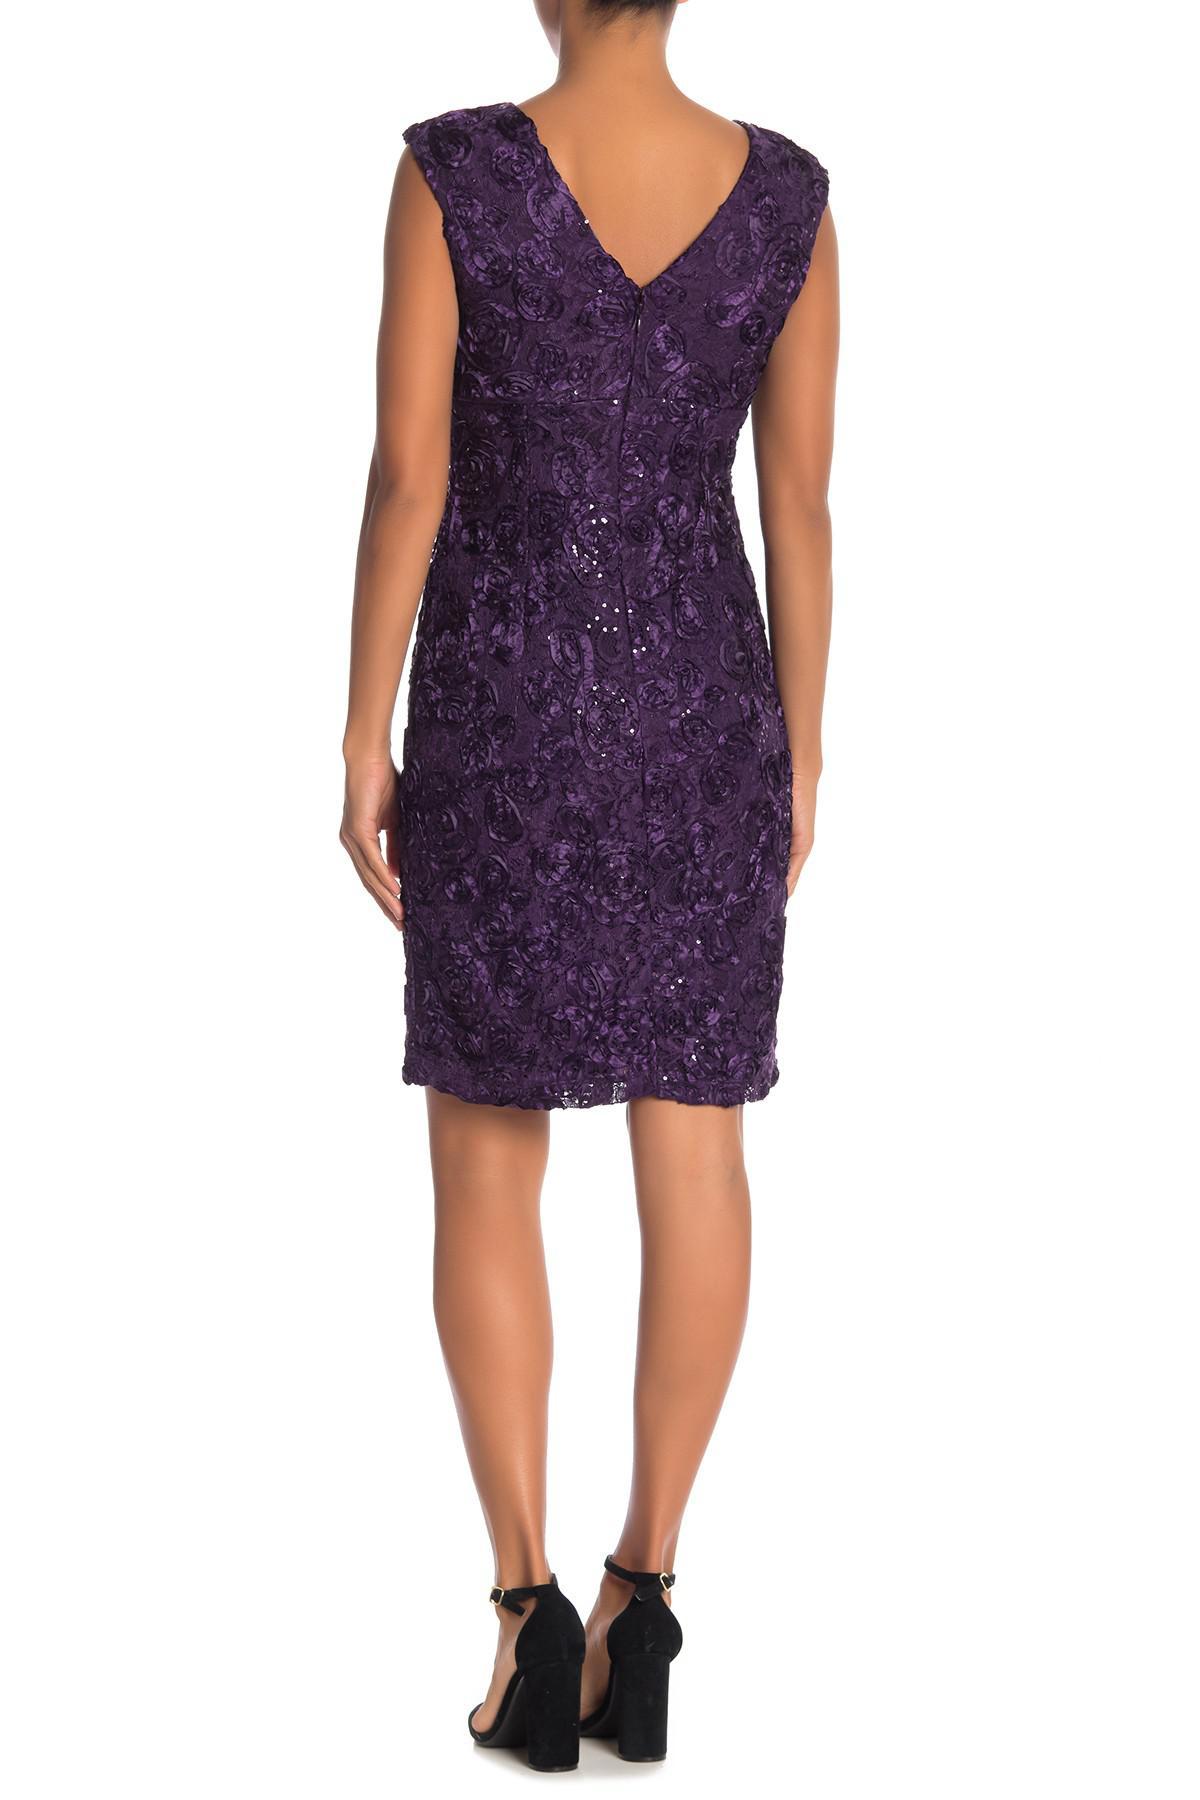 24bbc311cc50 Marina. Women's Purple Floral Applique Cap Sleeve Dress. $139 $60 From Nordstrom  Rack